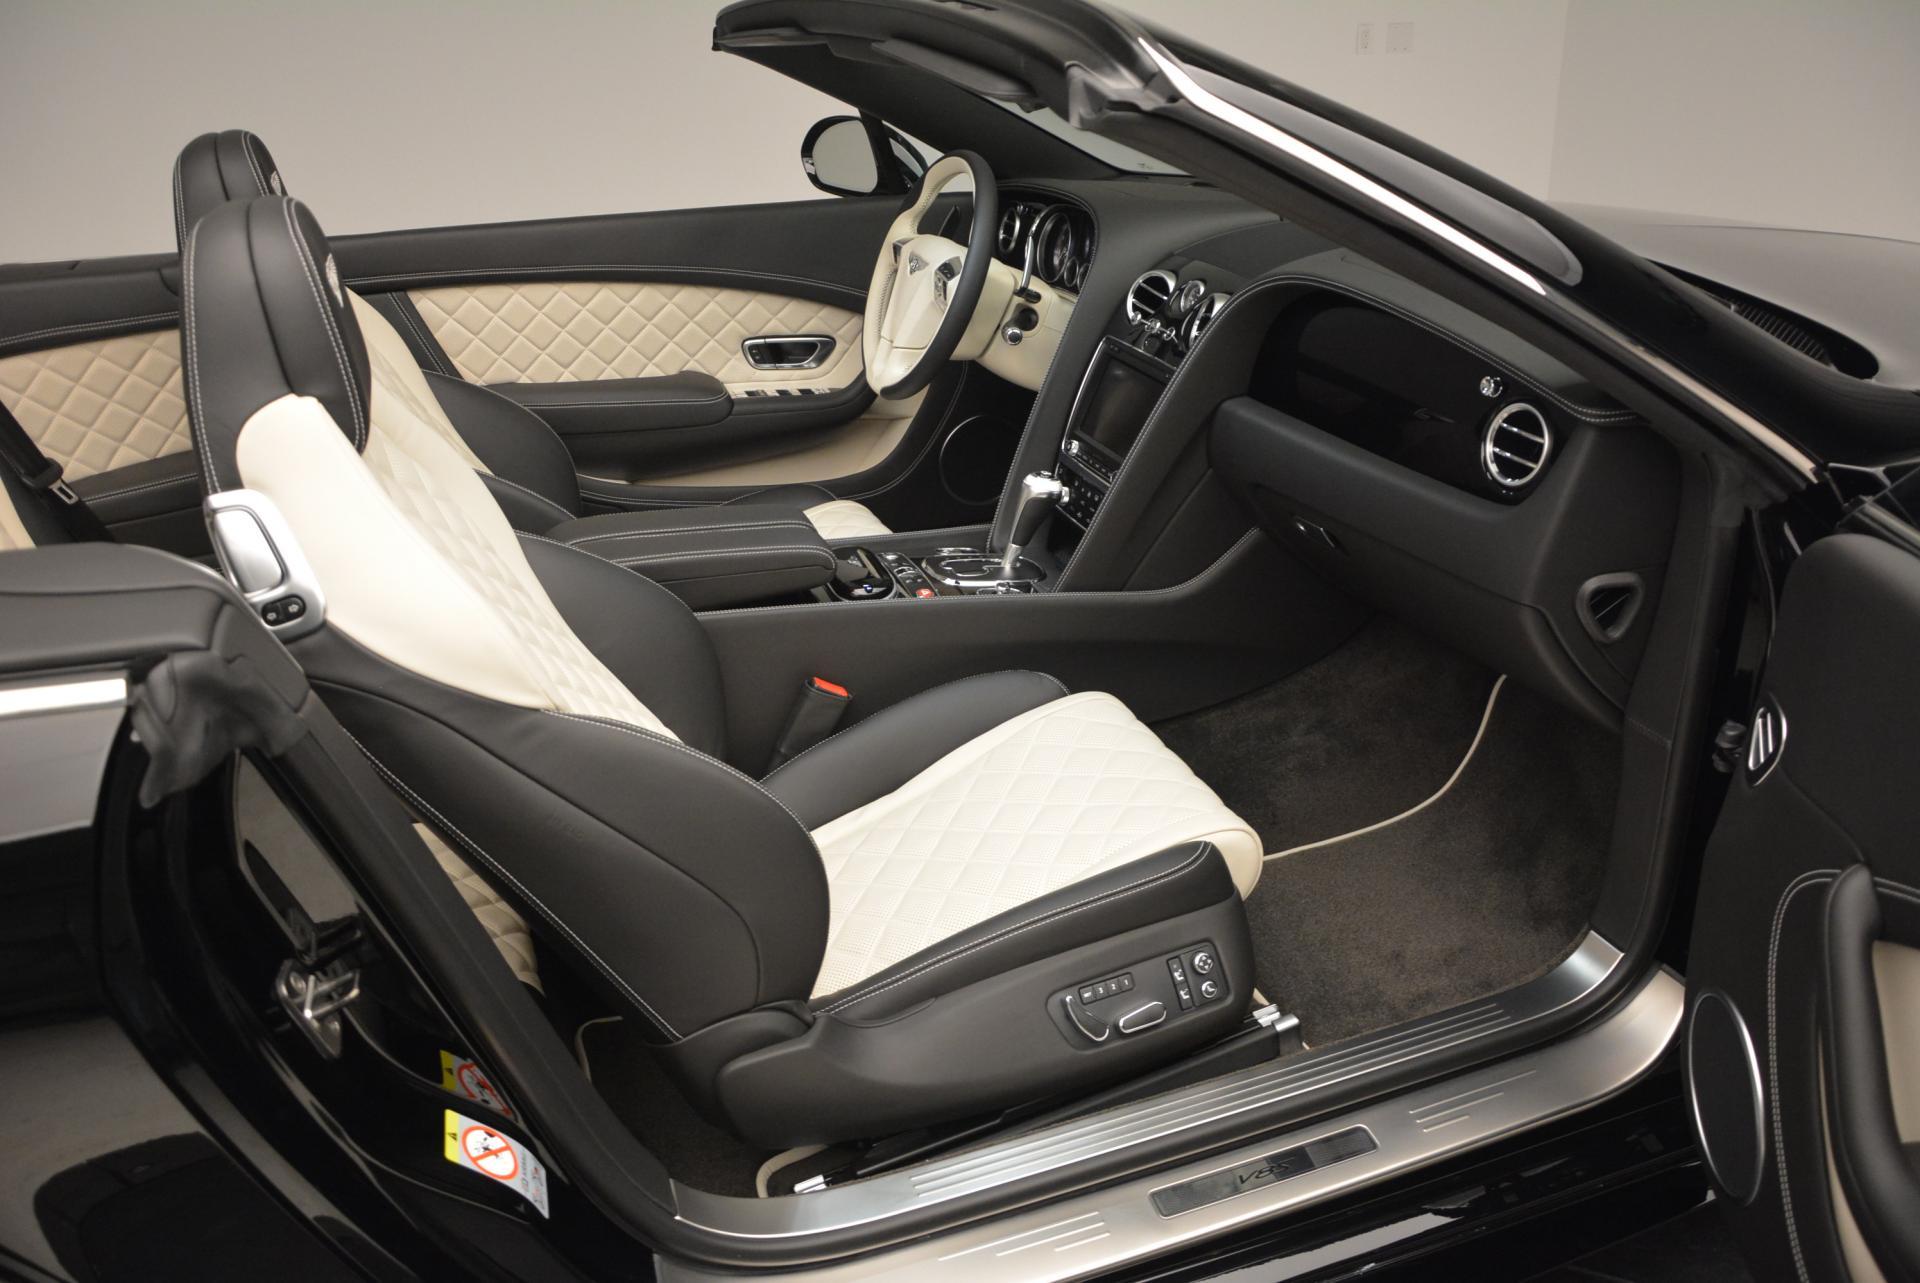 New 2016 Bentley Continental GT V8 S Convertible  For Sale In Westport, CT 13_p41